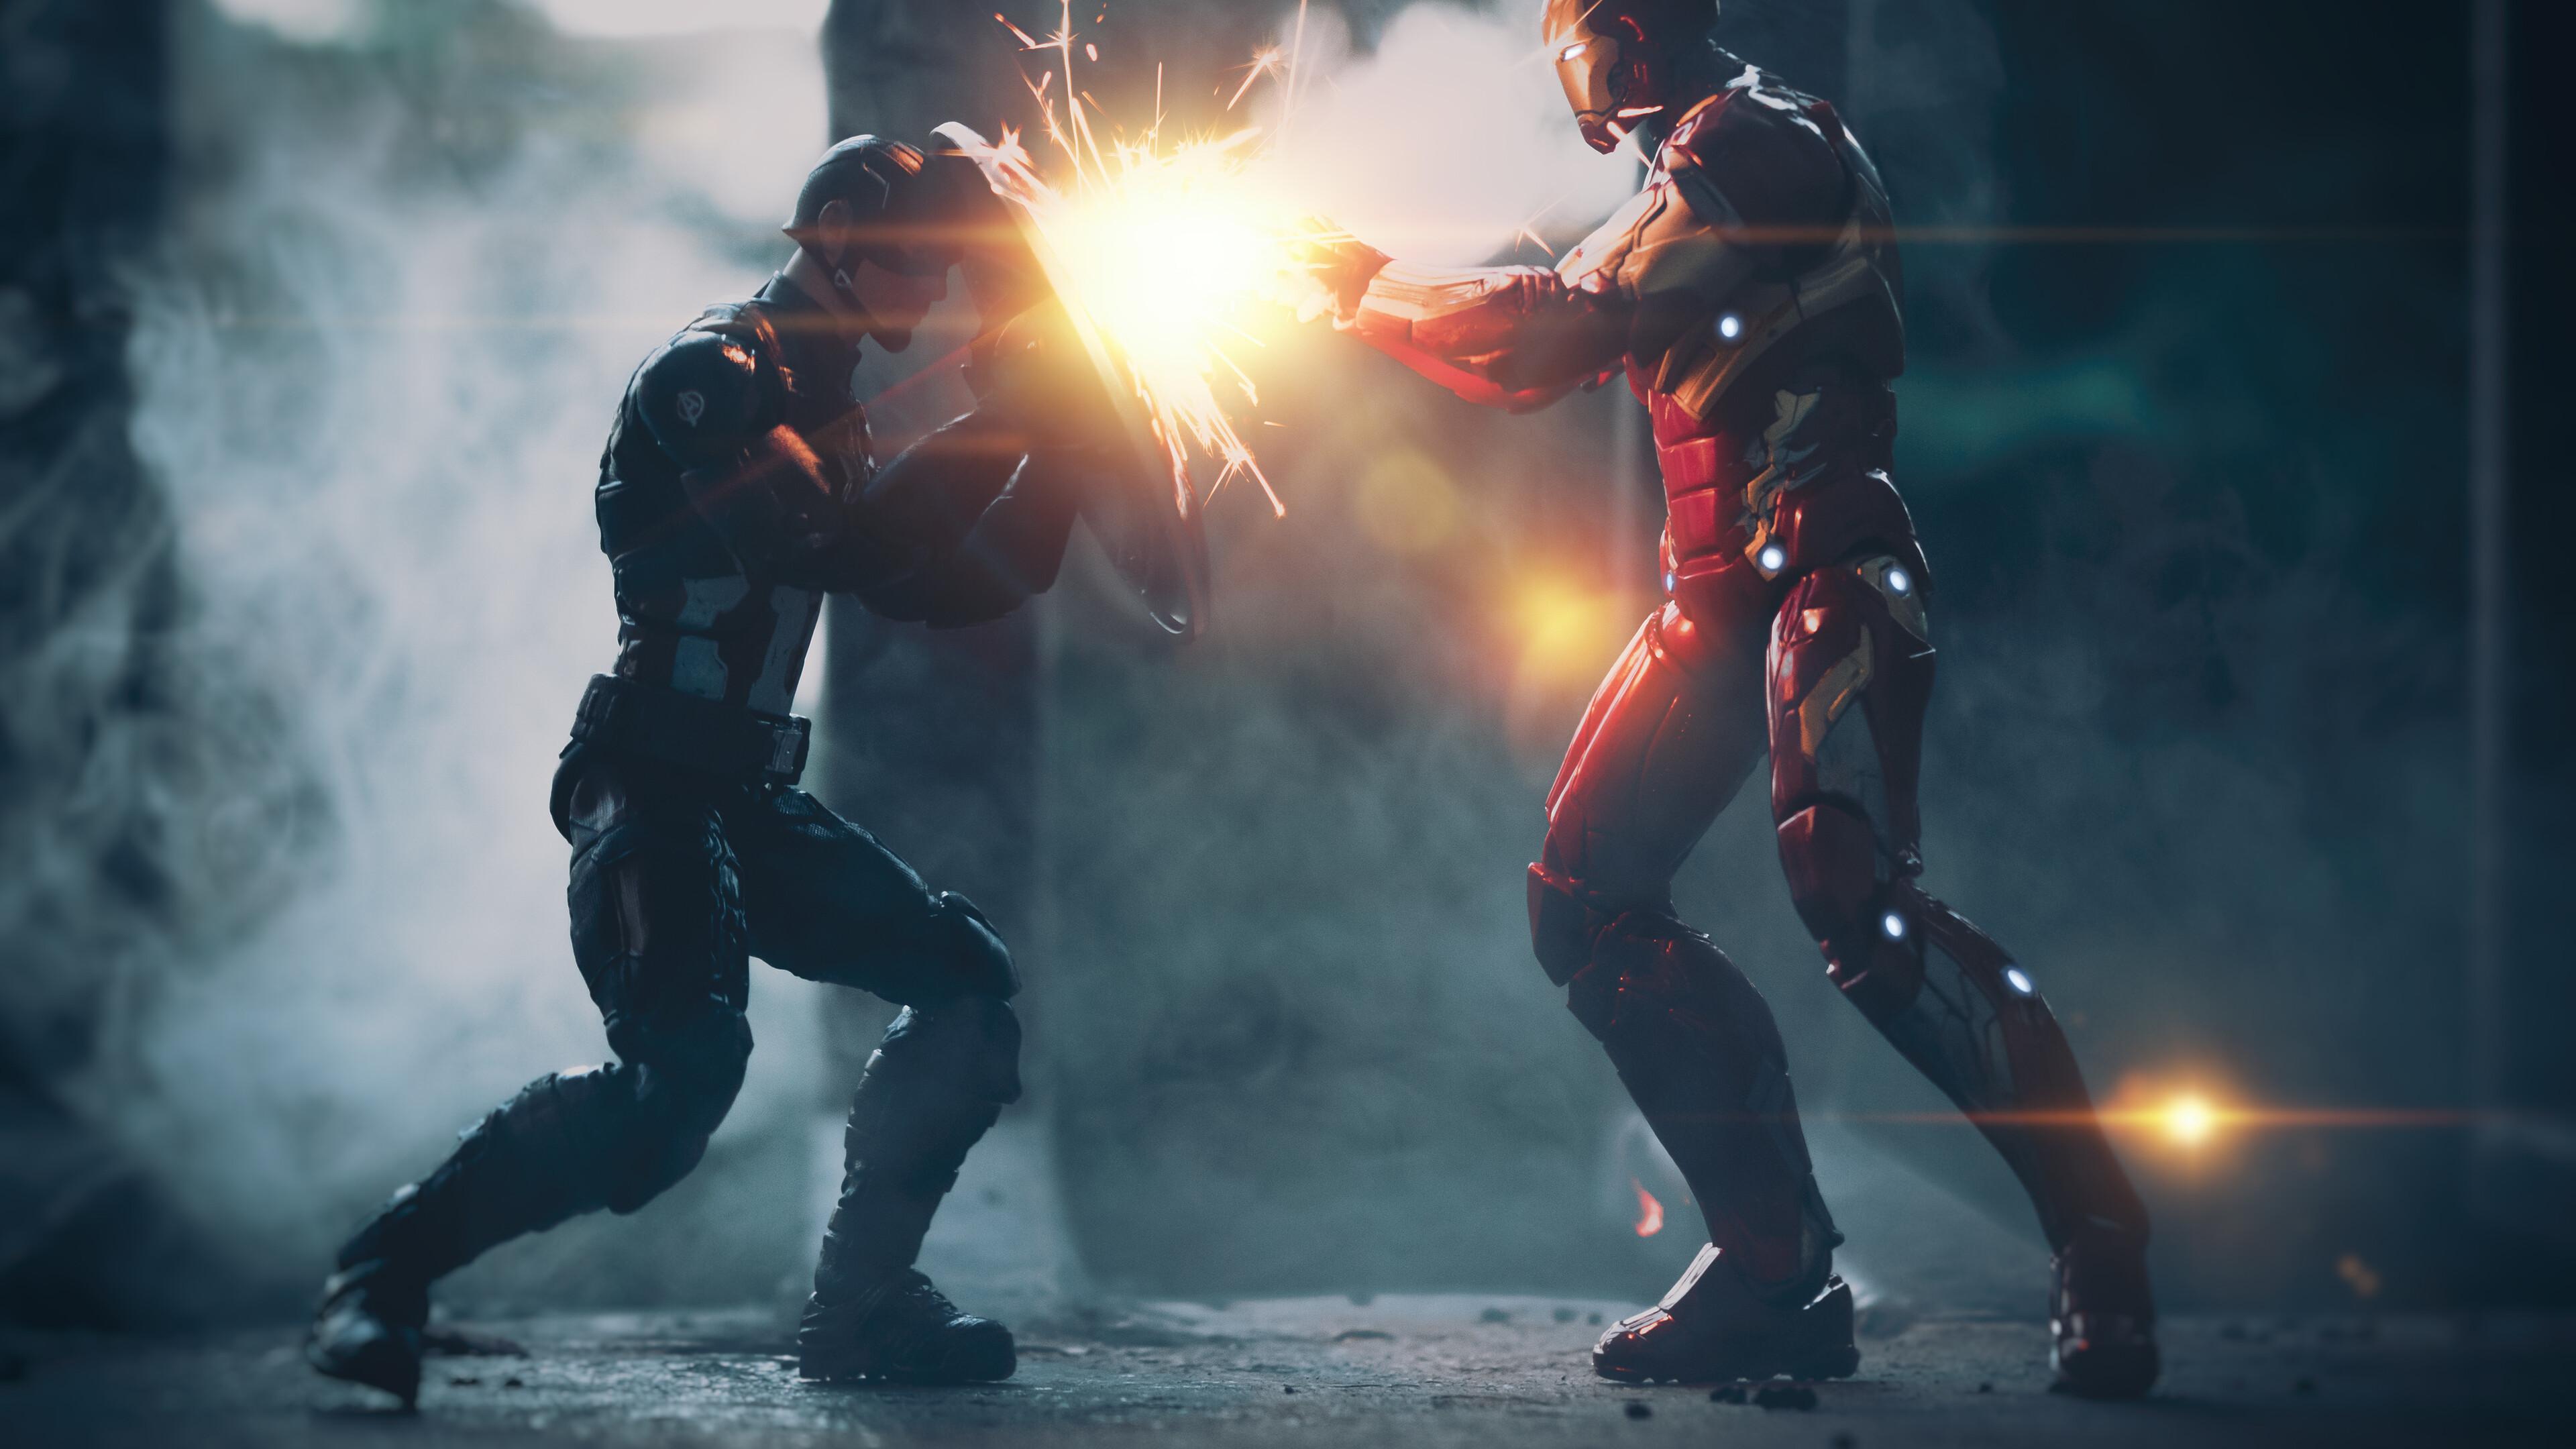 3840x2160 Captain America Vs Iron Man Artwork 5k 4k Hd 4k